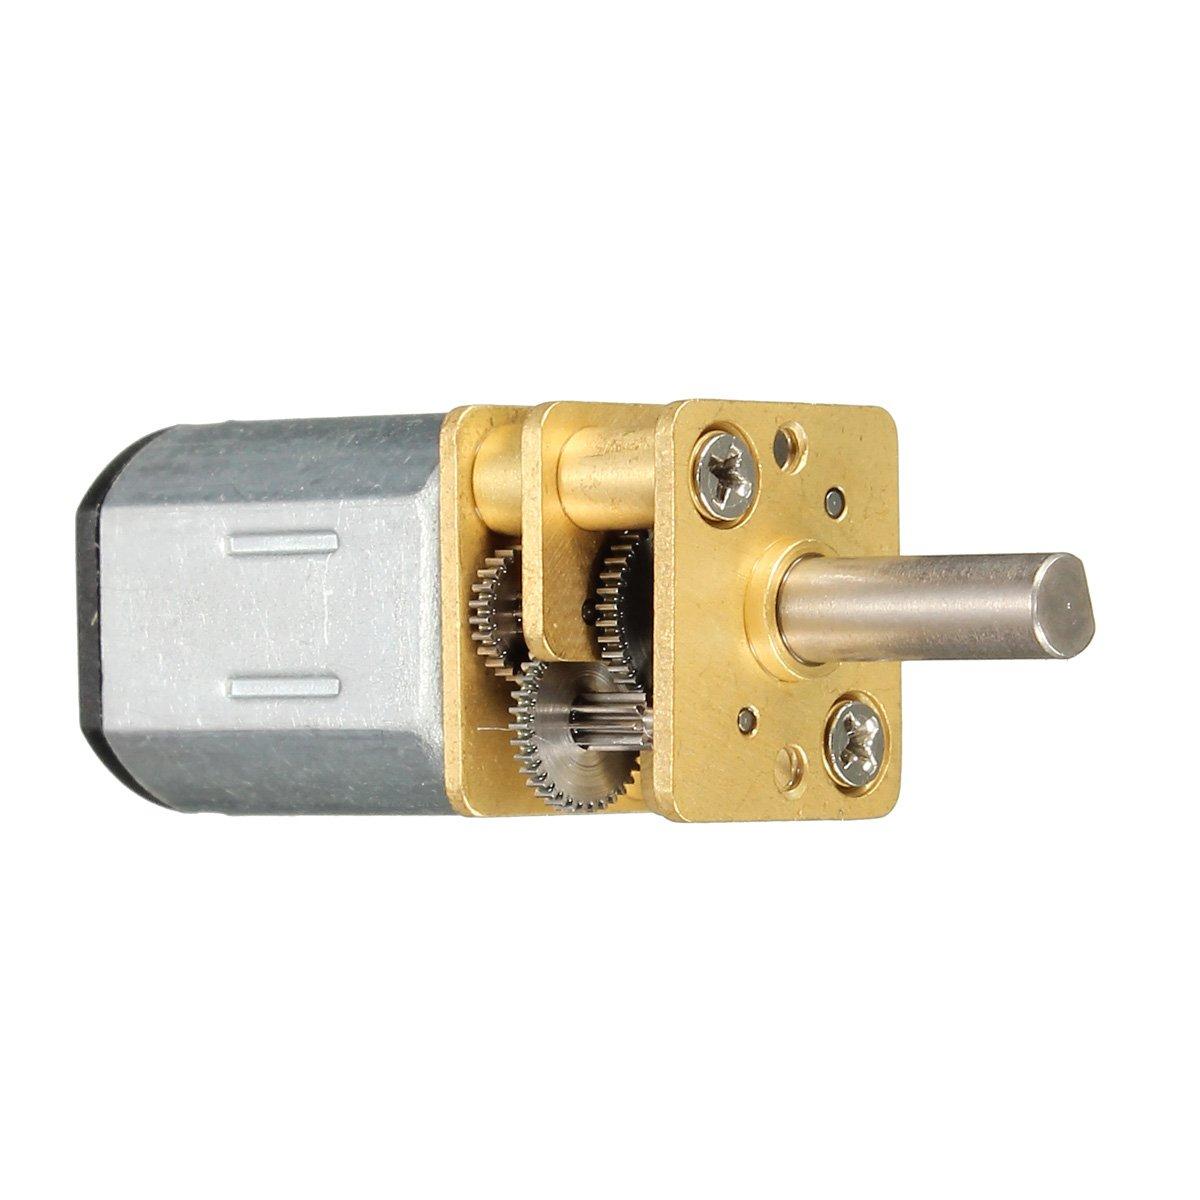 N20-6V-30 RPM Micro Metal Gear-box DC Motor